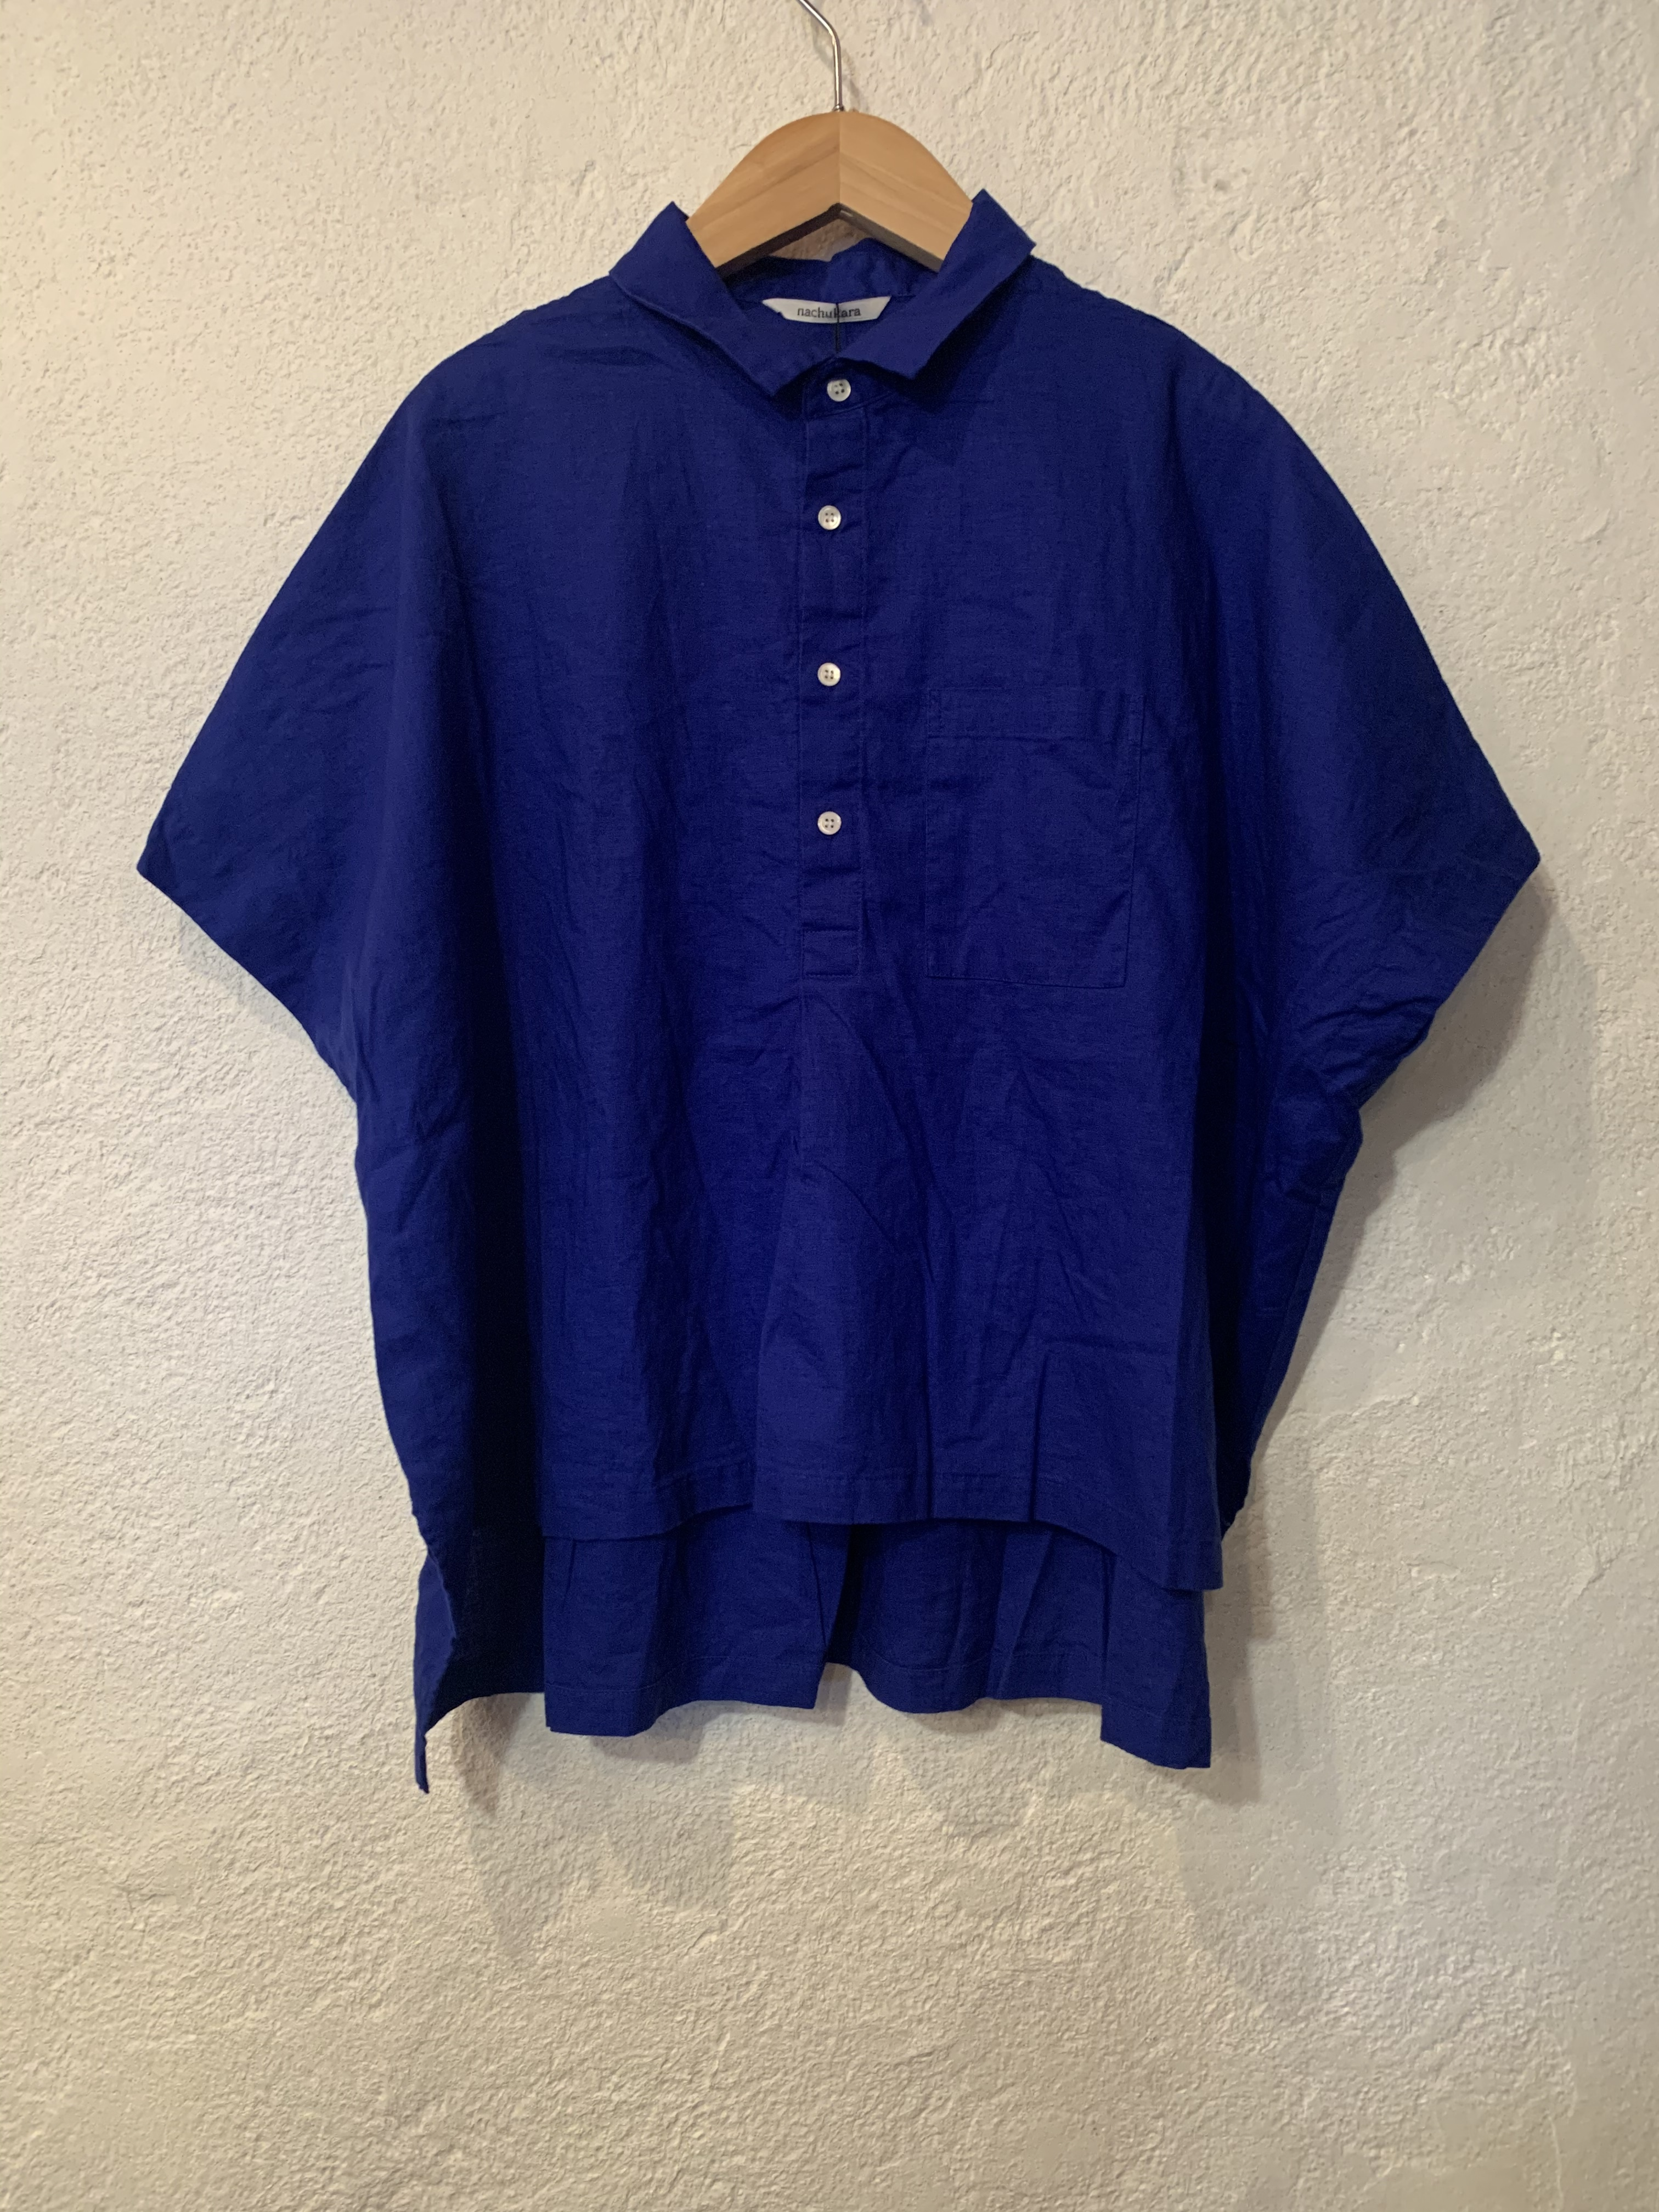 nachukara/5分袖プルオーバーブラウス  ブルー